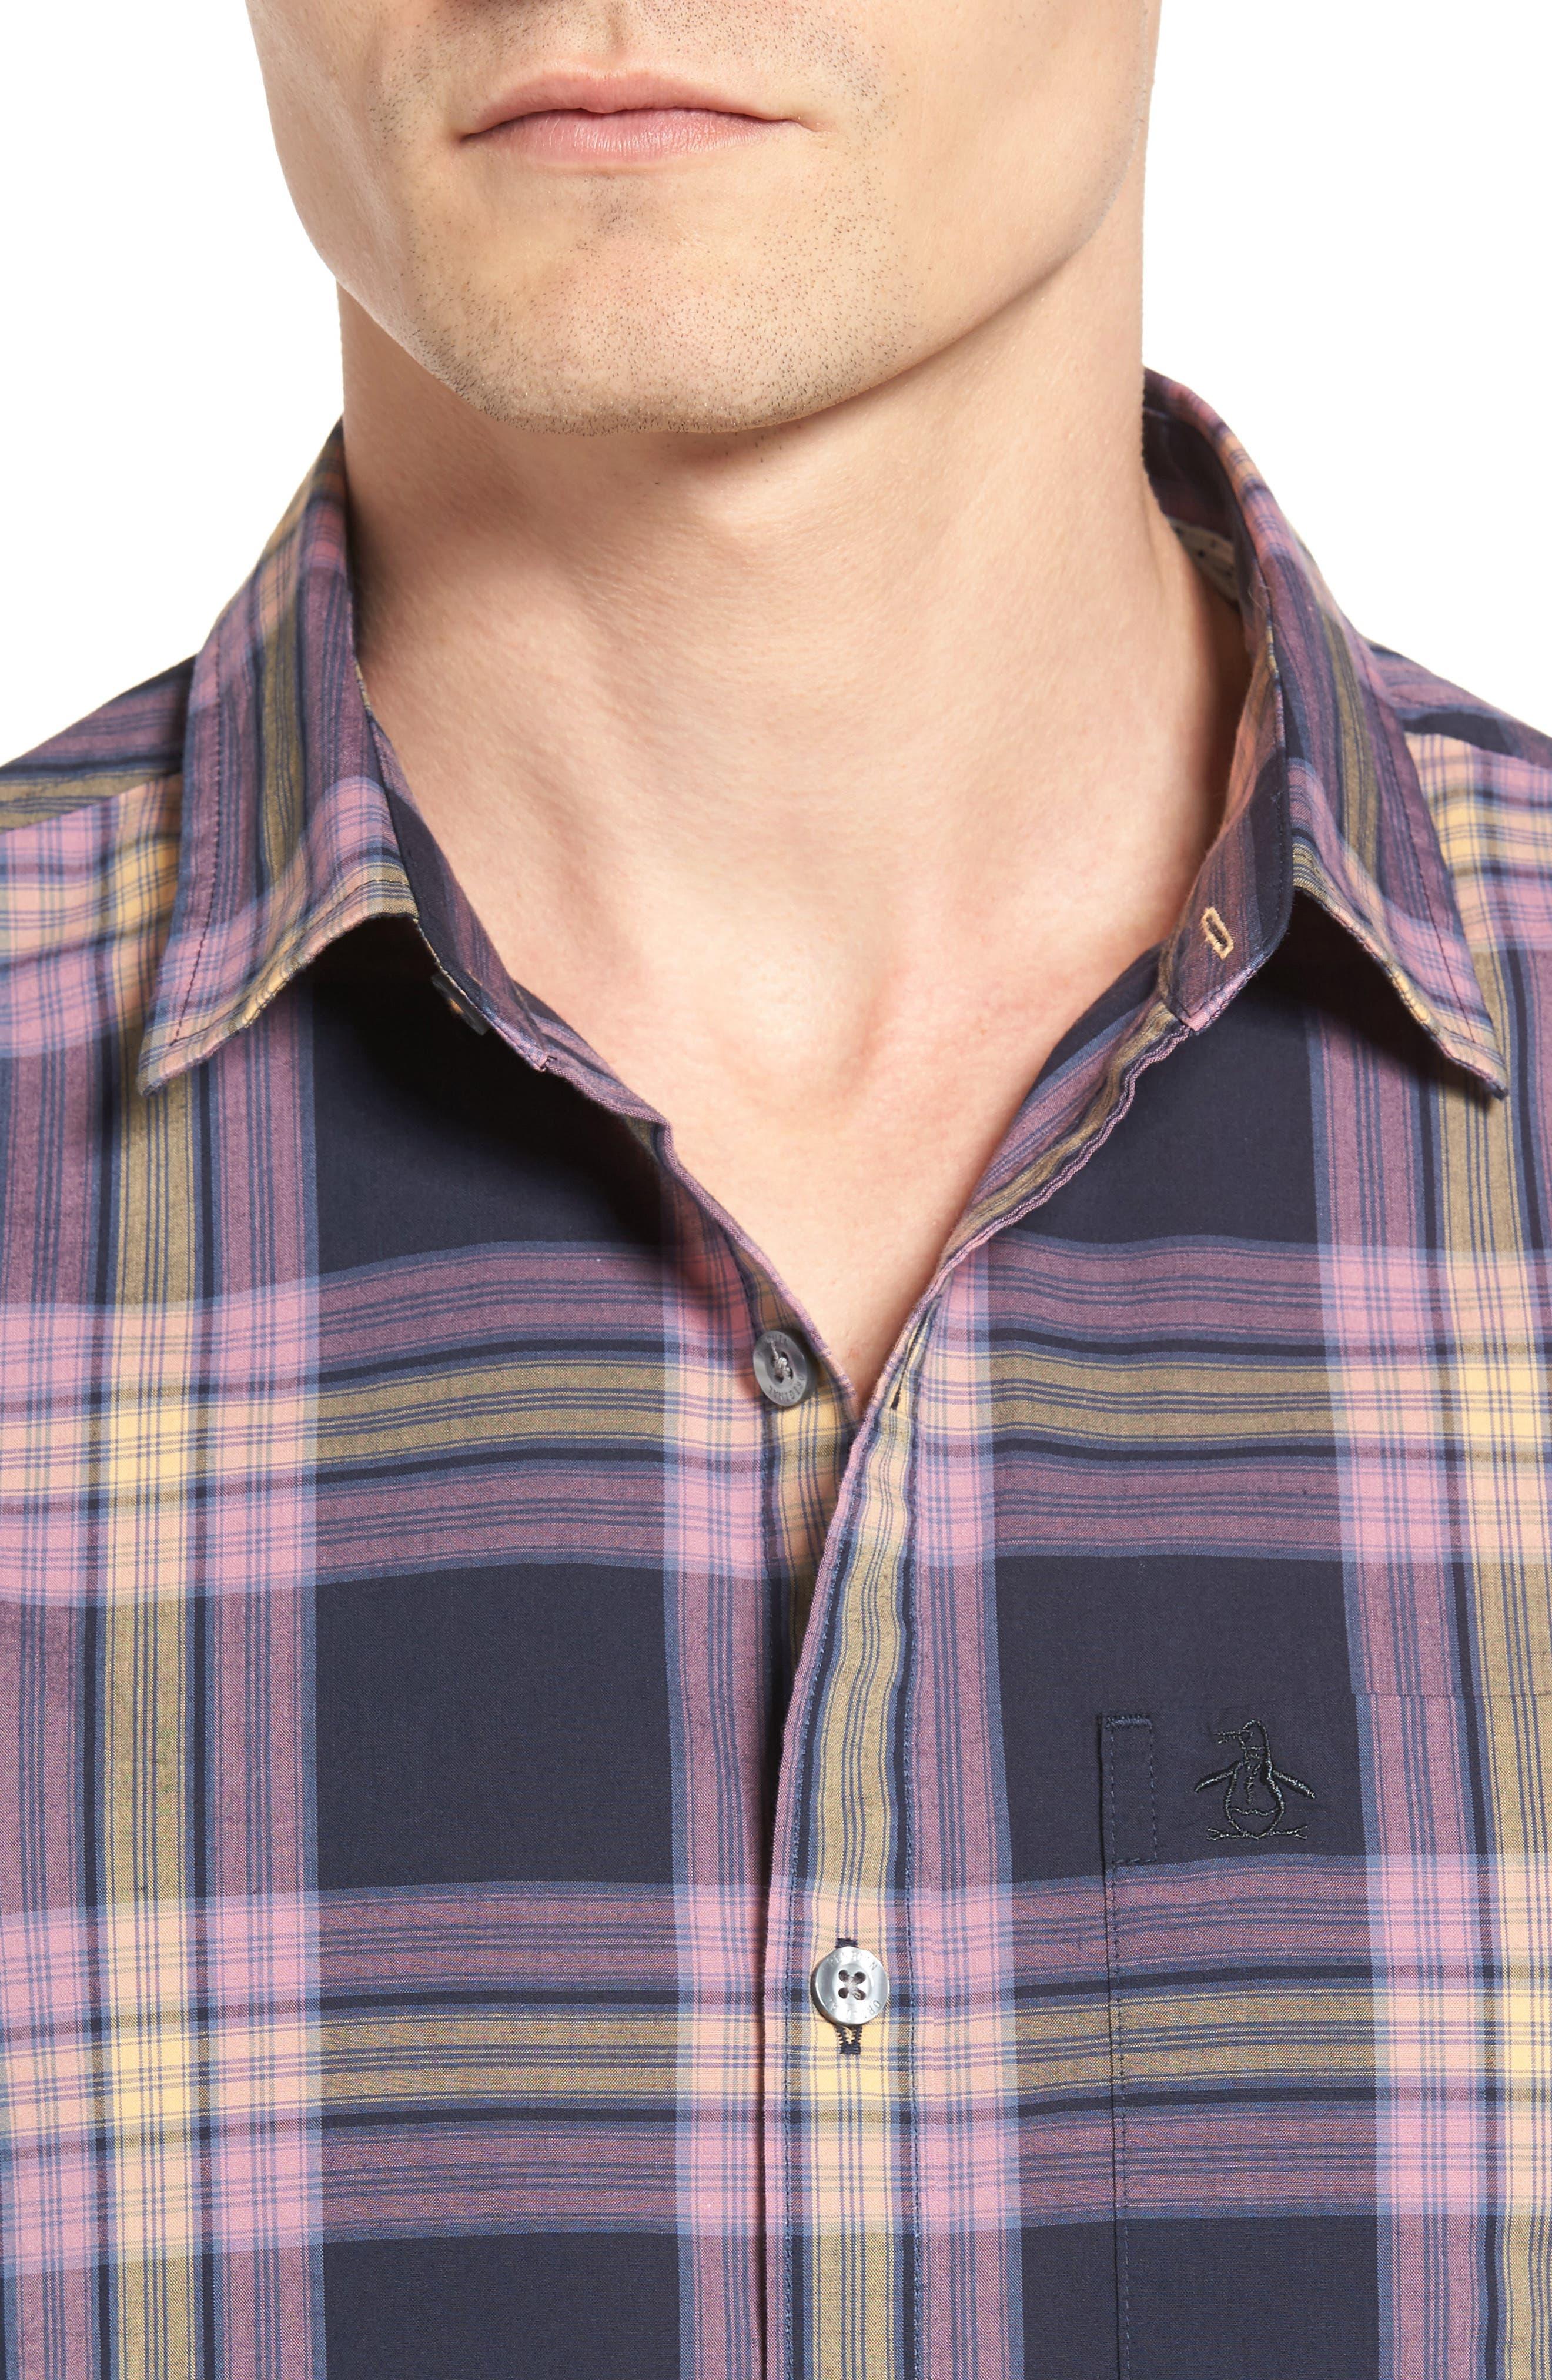 Heritage Slim Fit Plaid Woven Shirt,                             Alternate thumbnail 4, color,                             Dark Sapphire